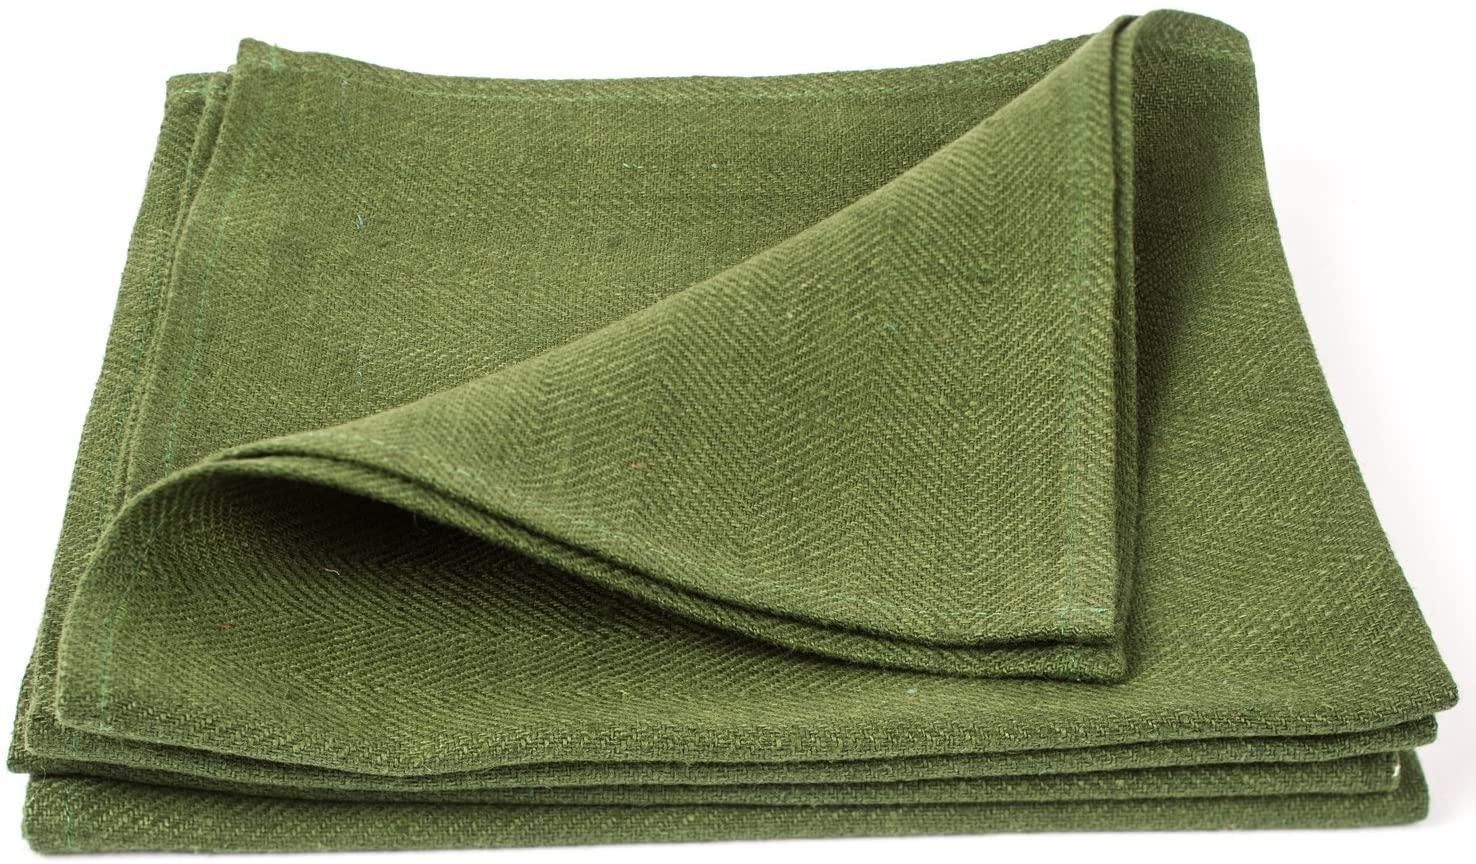 LinenMe X4 Lara Napkins, 20 x 20, Dark Green